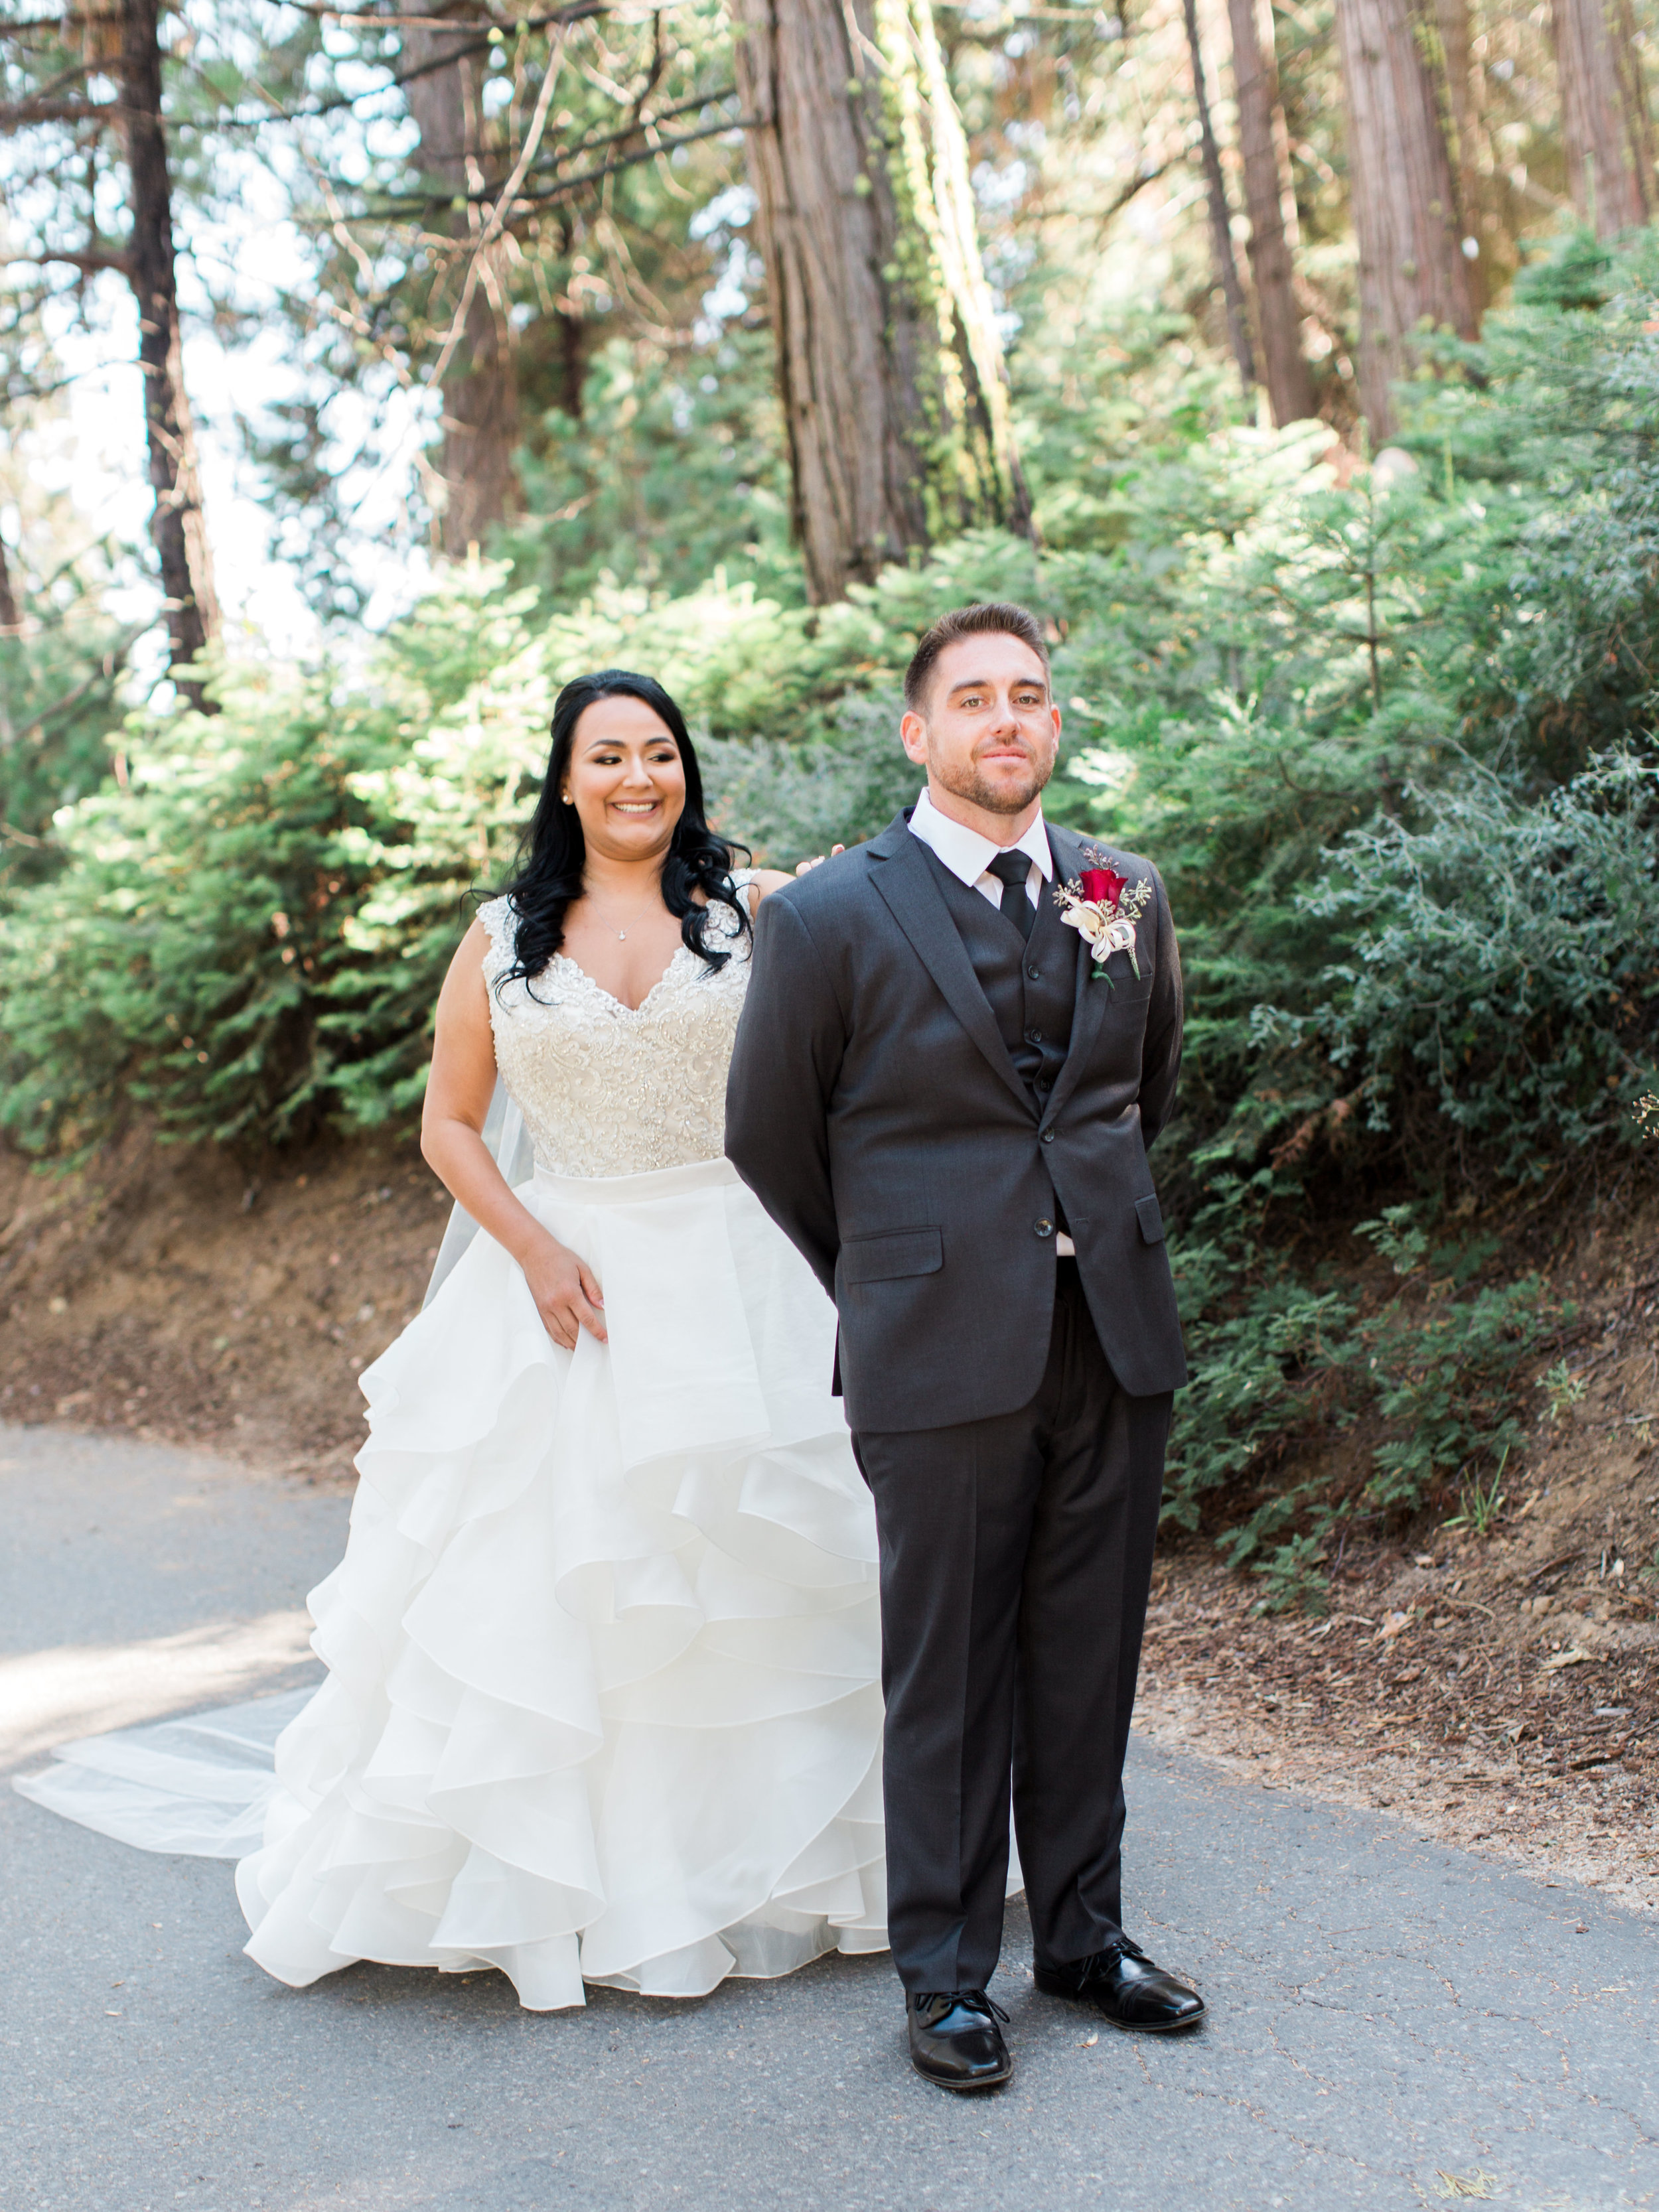 Yosemite-wedding-at-Tenaya-lodge-1-2.jpg